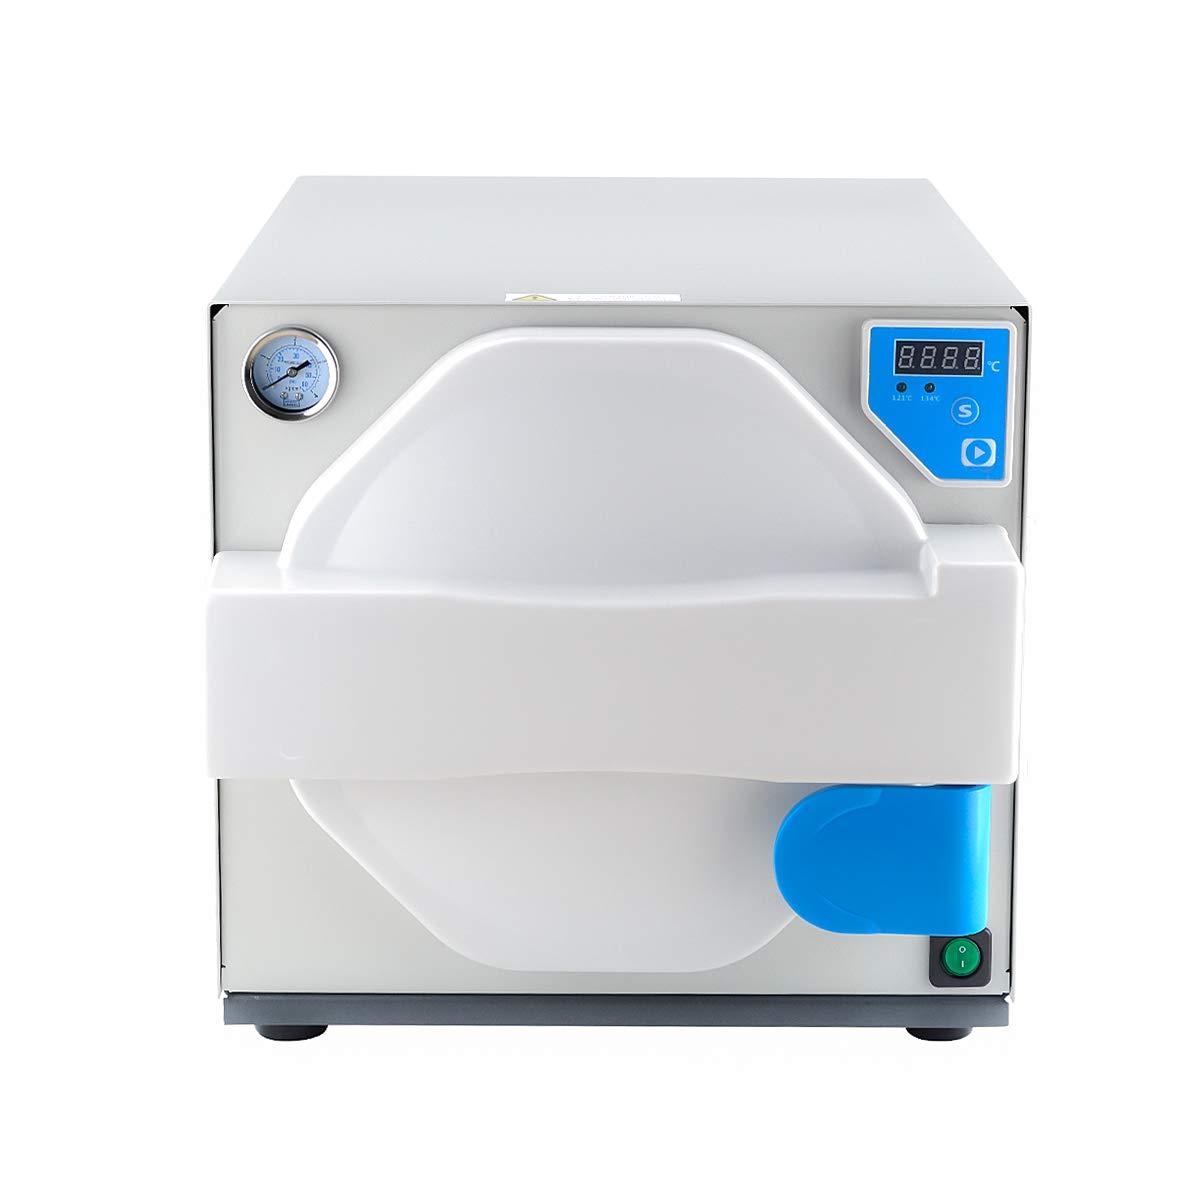 SOHOME 18L MINI320 Digital Display Autoclave Steam Lab Machine by SoHome (Image #3)